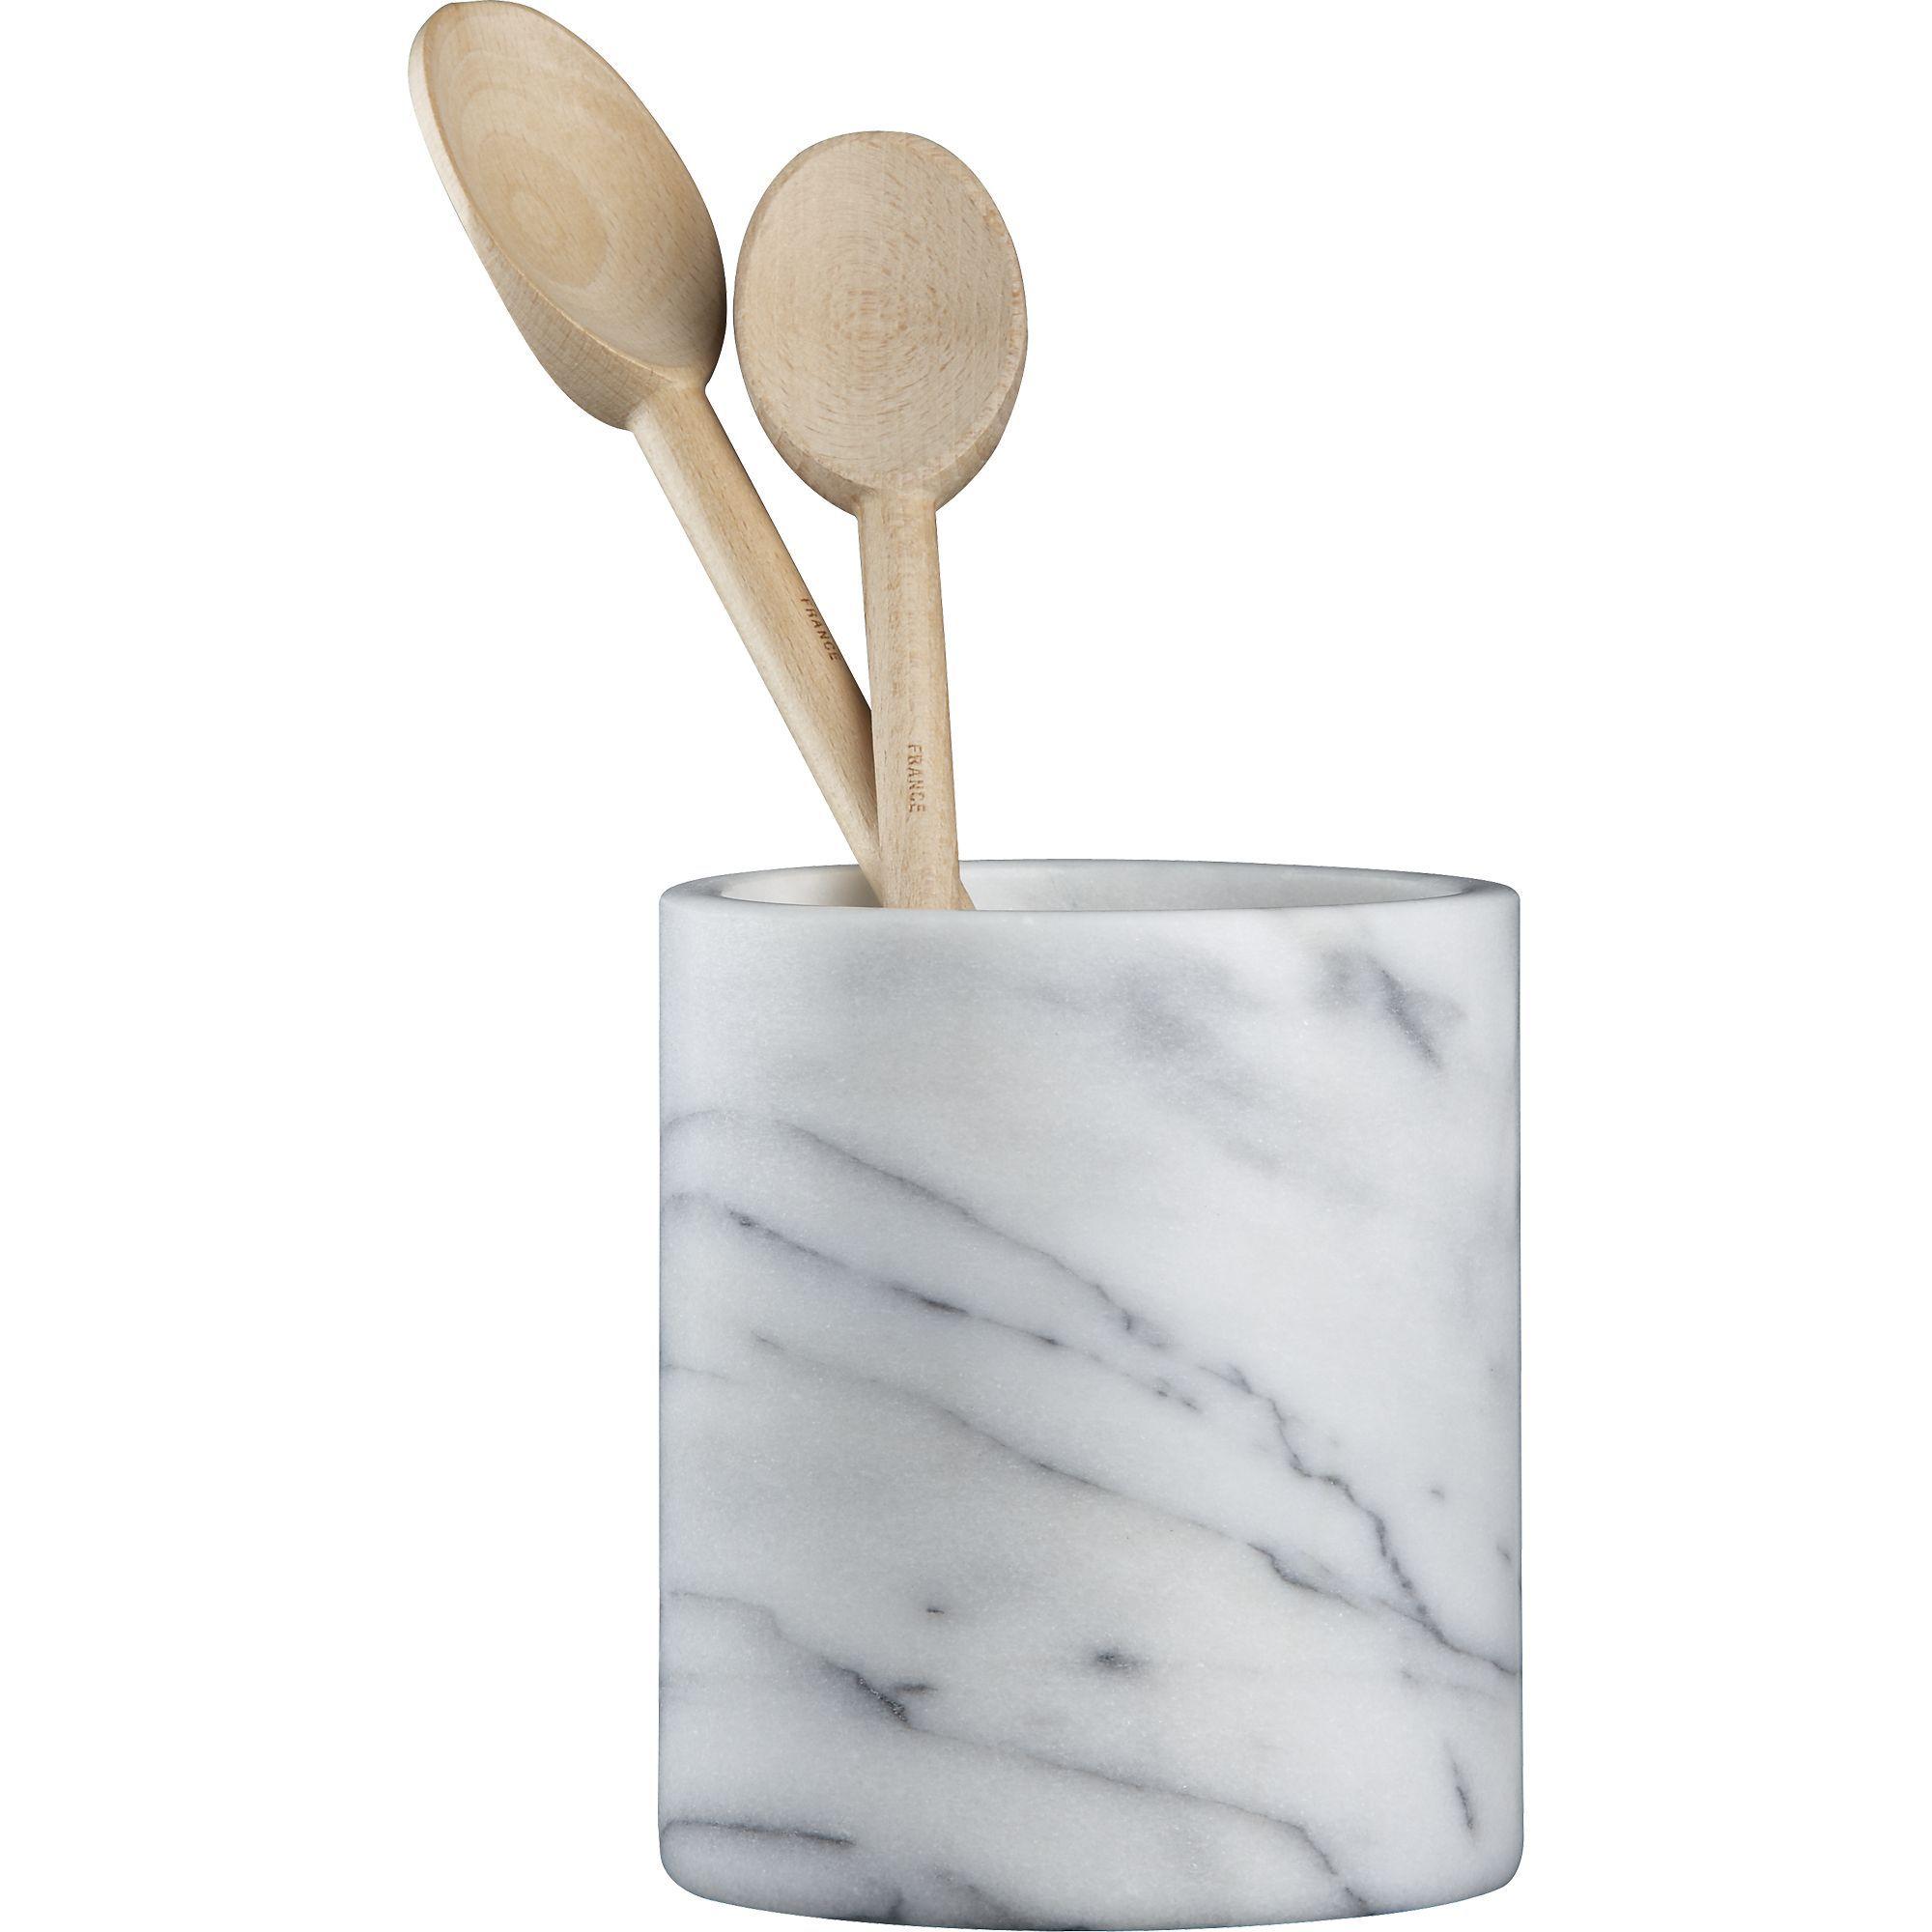 French Kitchen Marble Utensil Crock